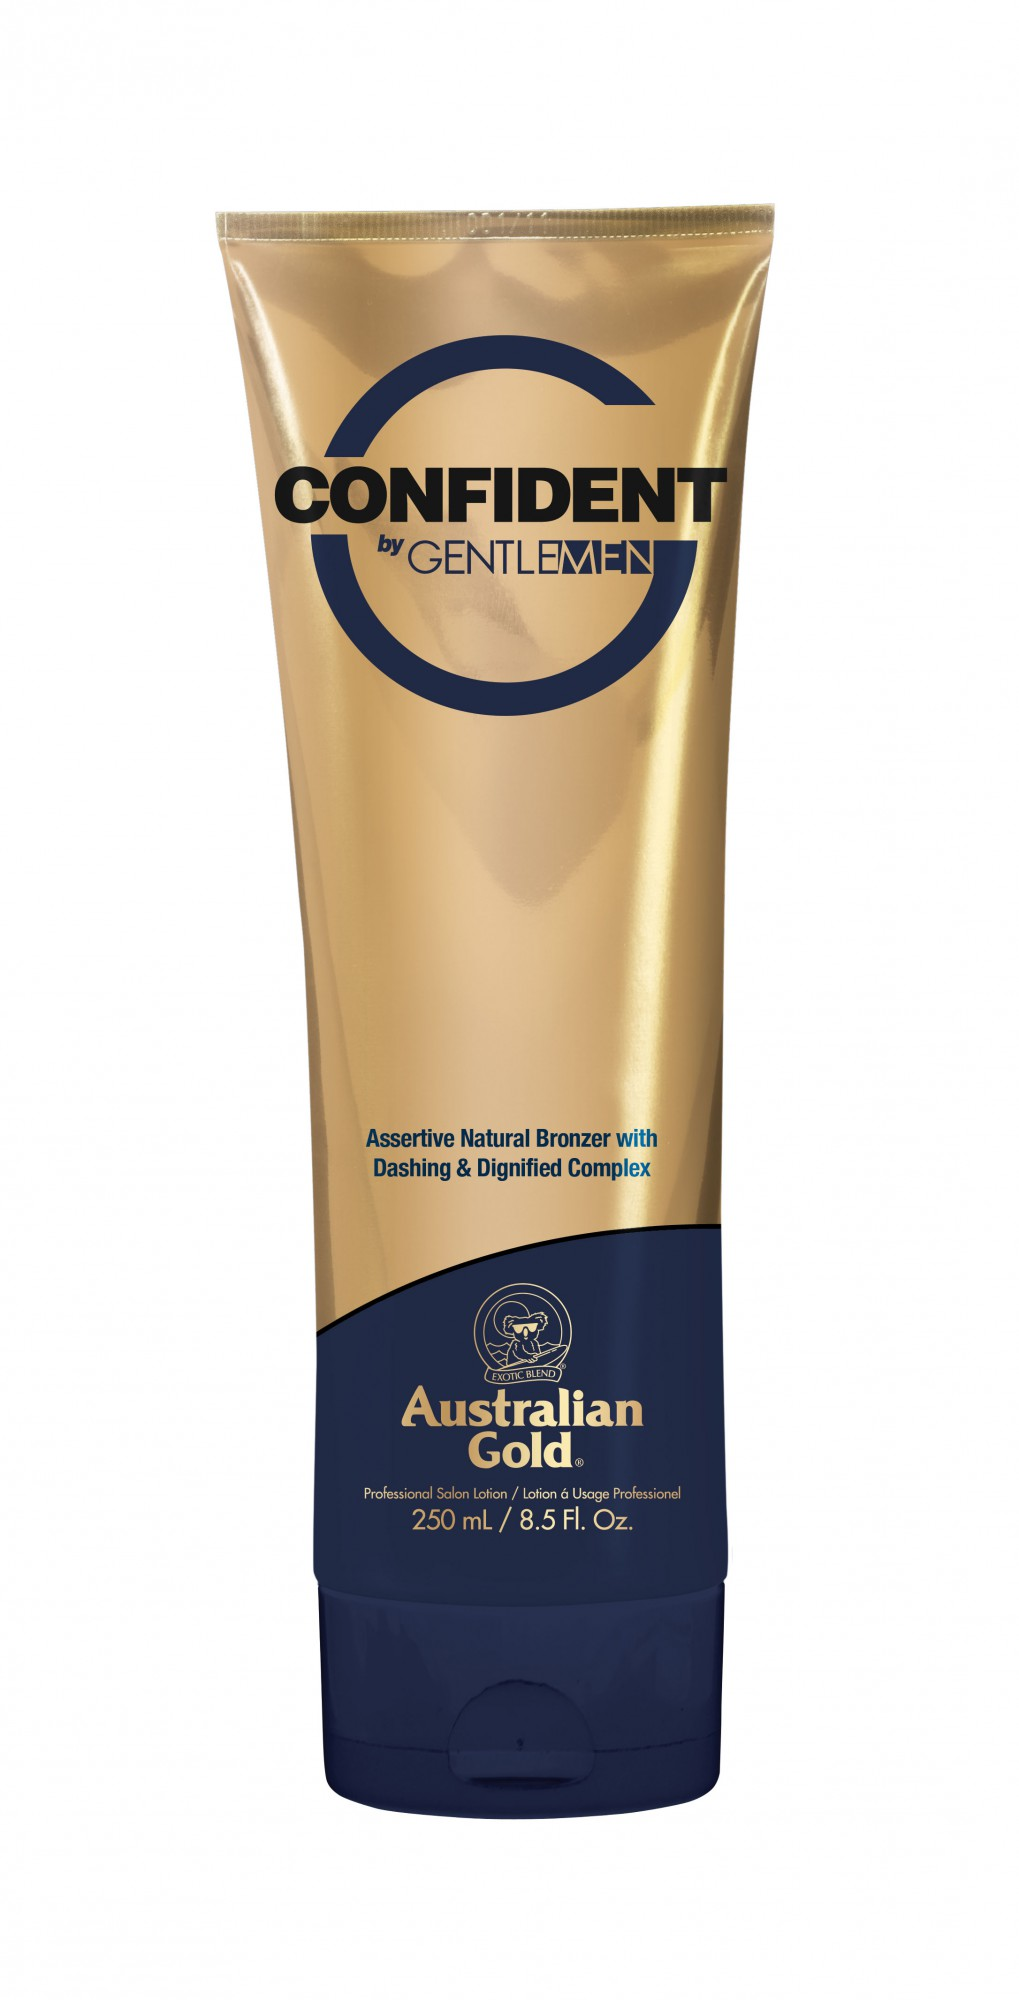 Confident by G Gentlemen® Lightweight Assertive Natural Bronzer